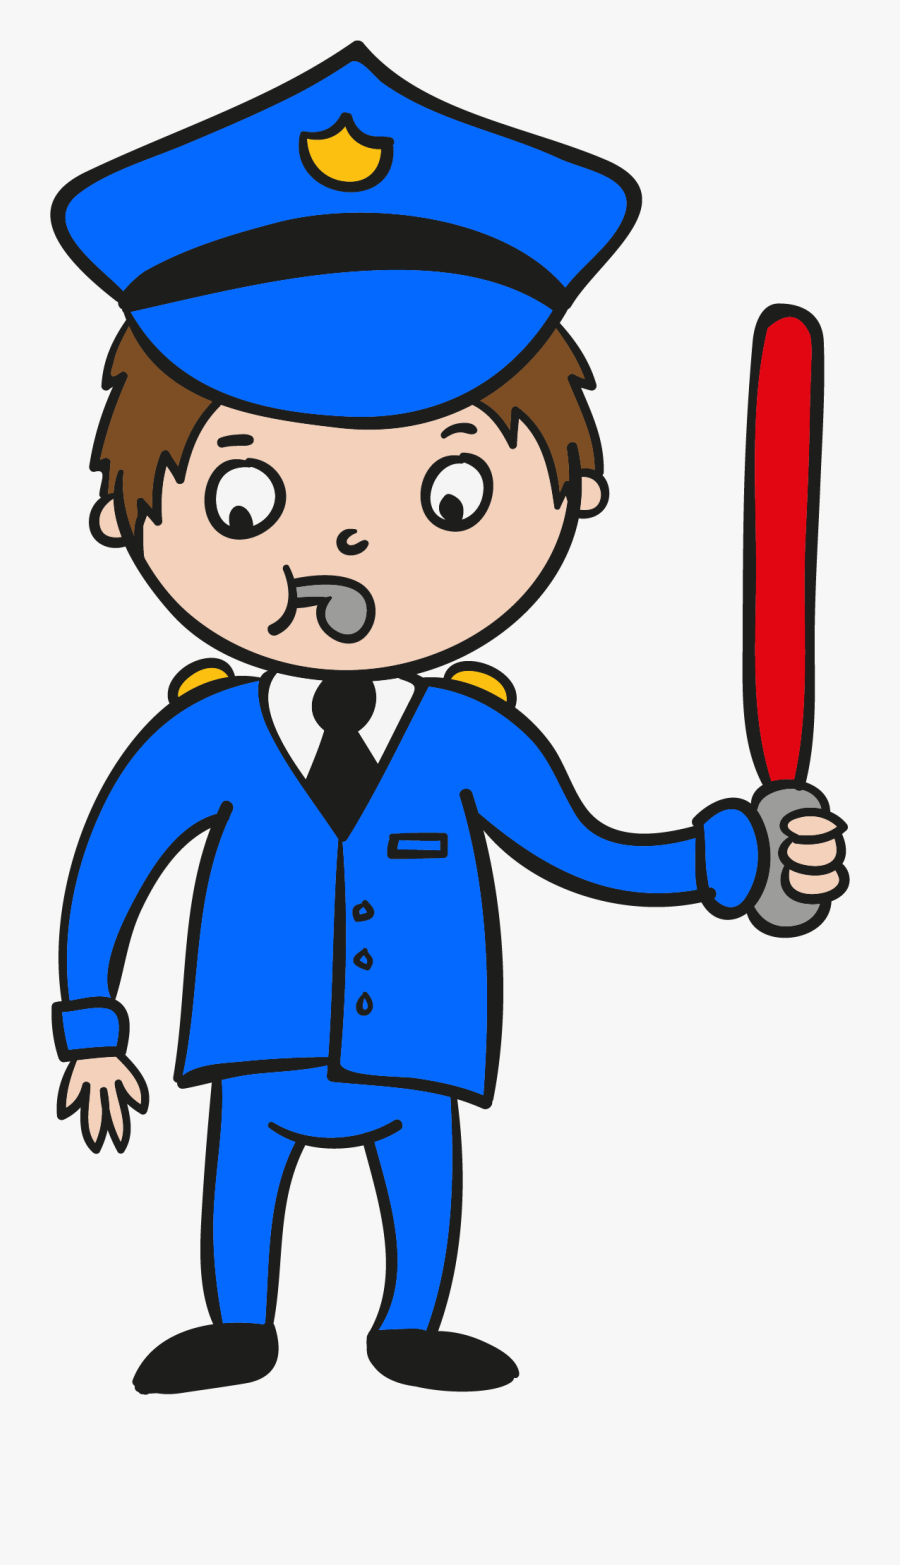 Cartoon Police Officer - Police Officer Cartoon, Transparent Clipart